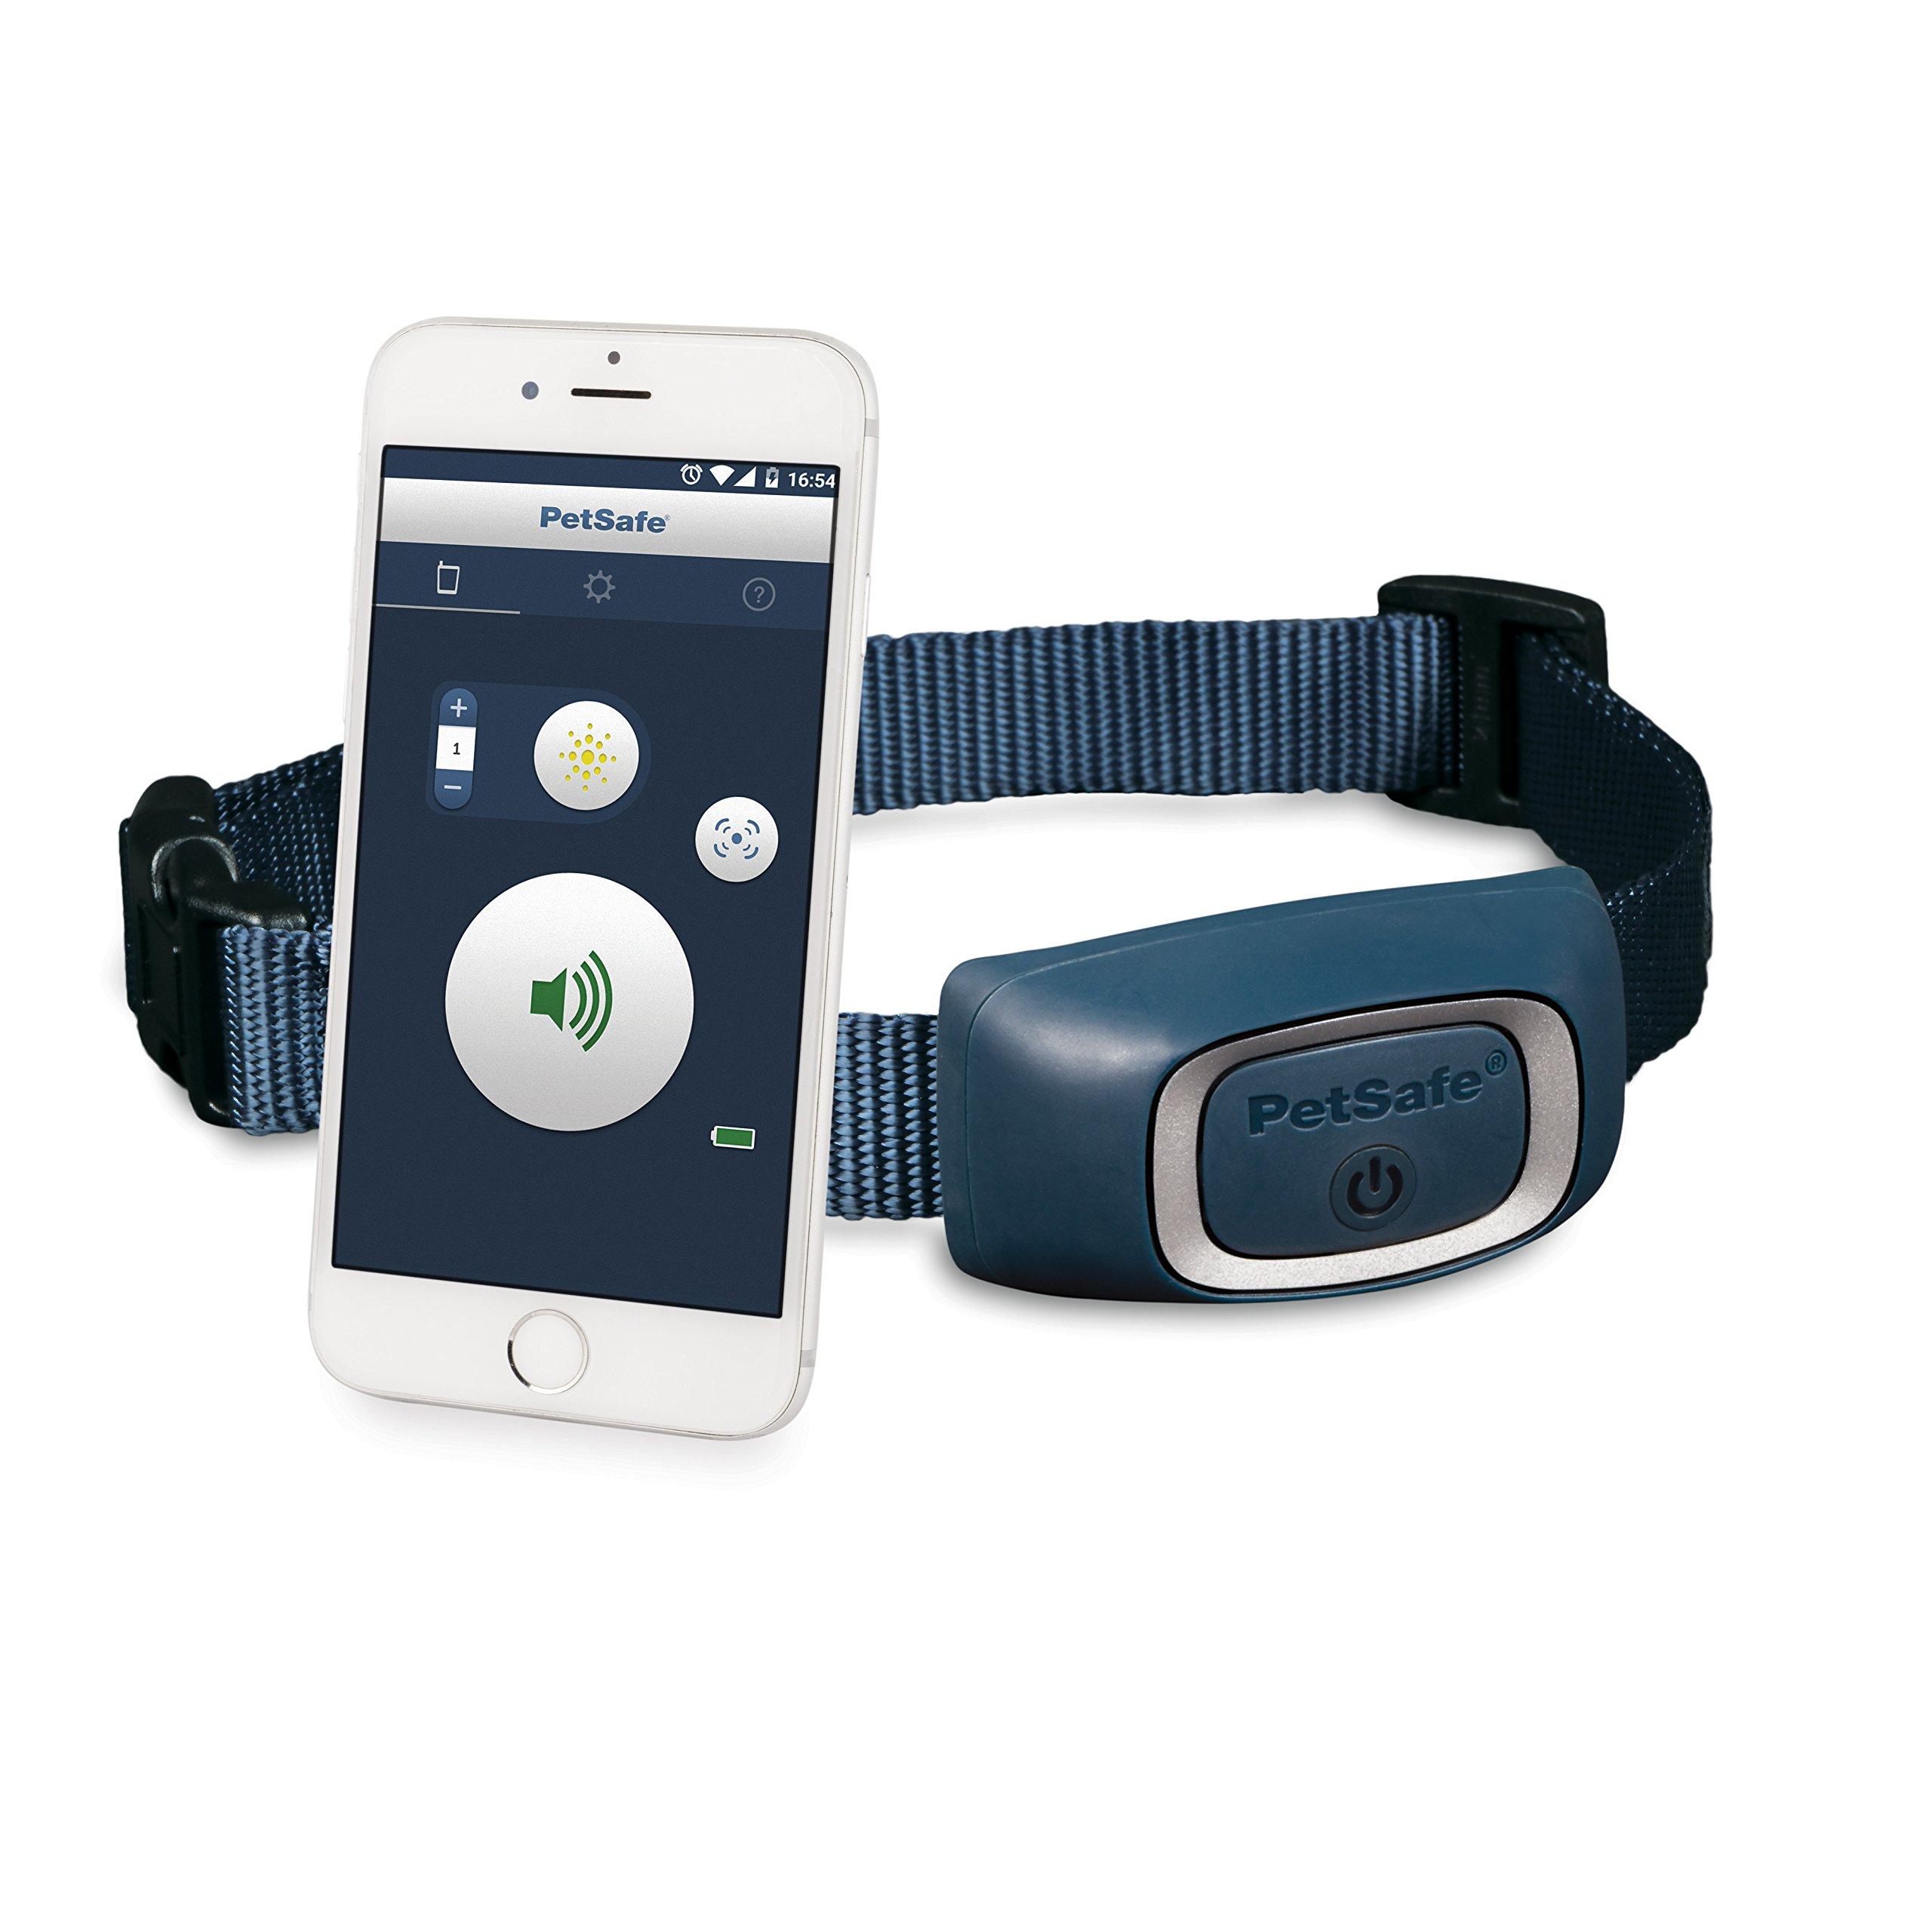 PetSafe Smart Dog Bluetooth Training Collar by PetSafe